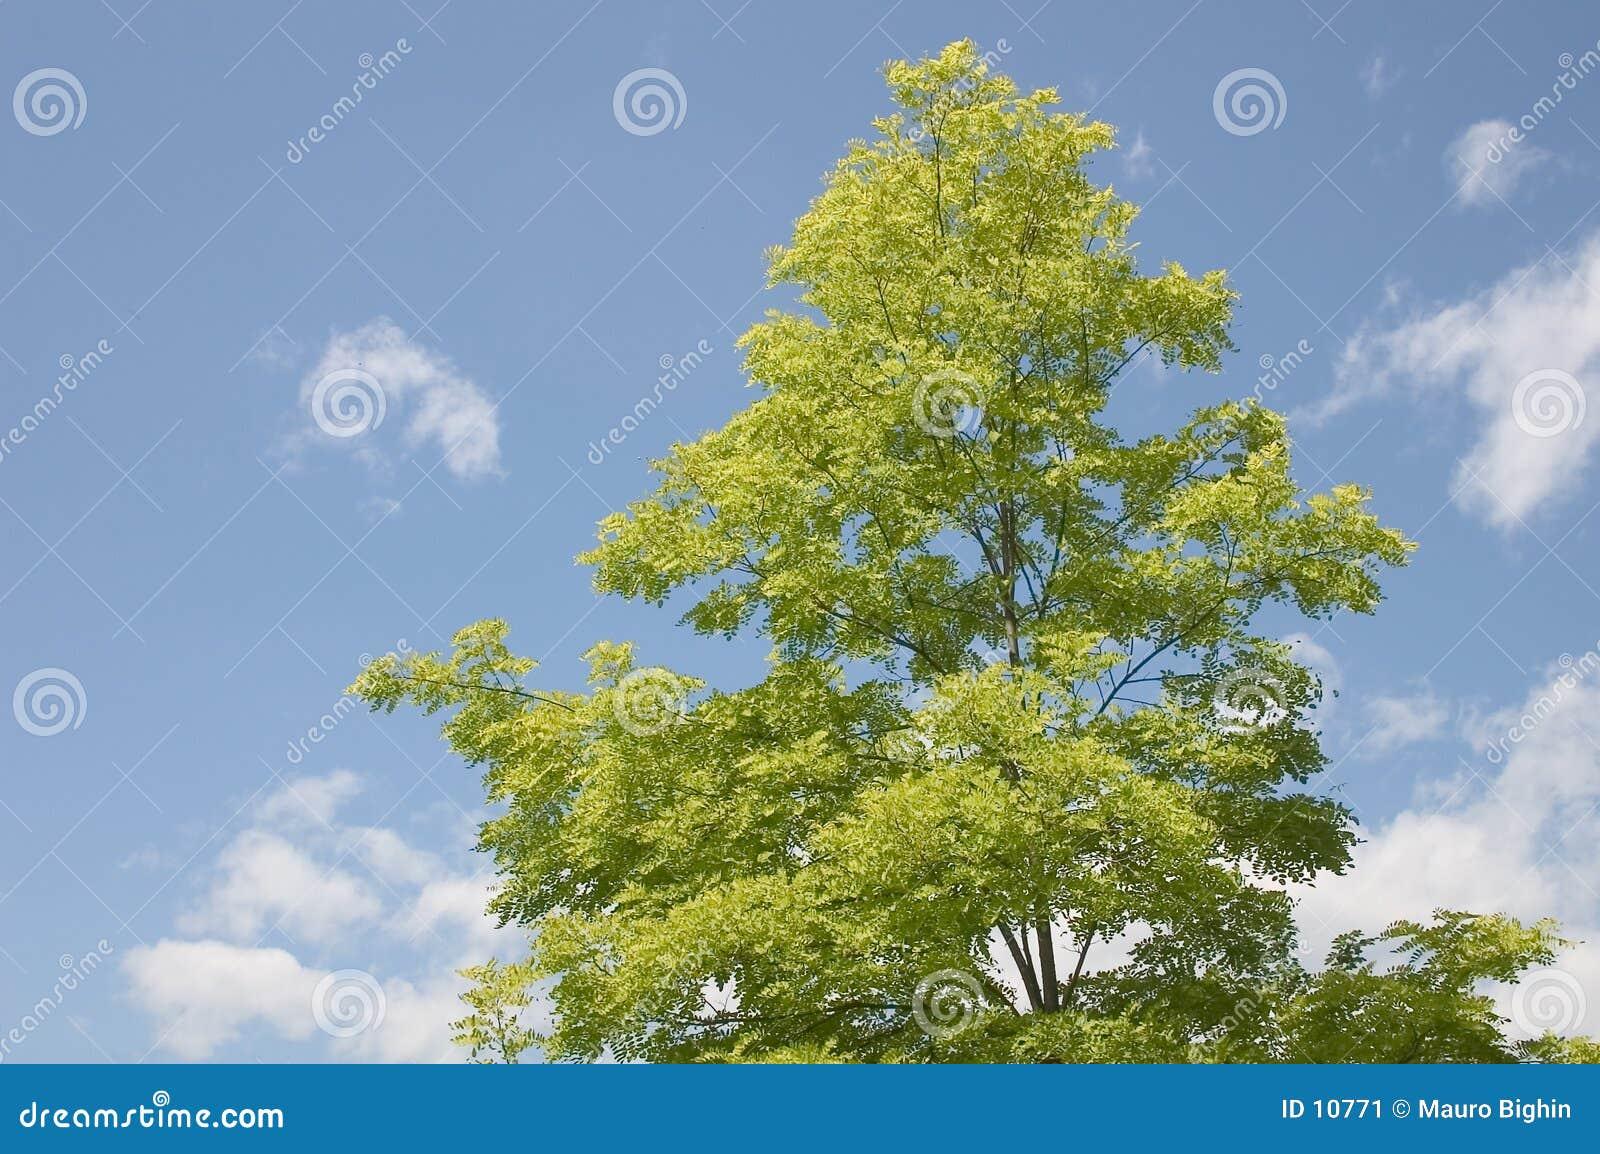 Download Tree stock image. Image of hush, imperturbation, impassivity - 10771